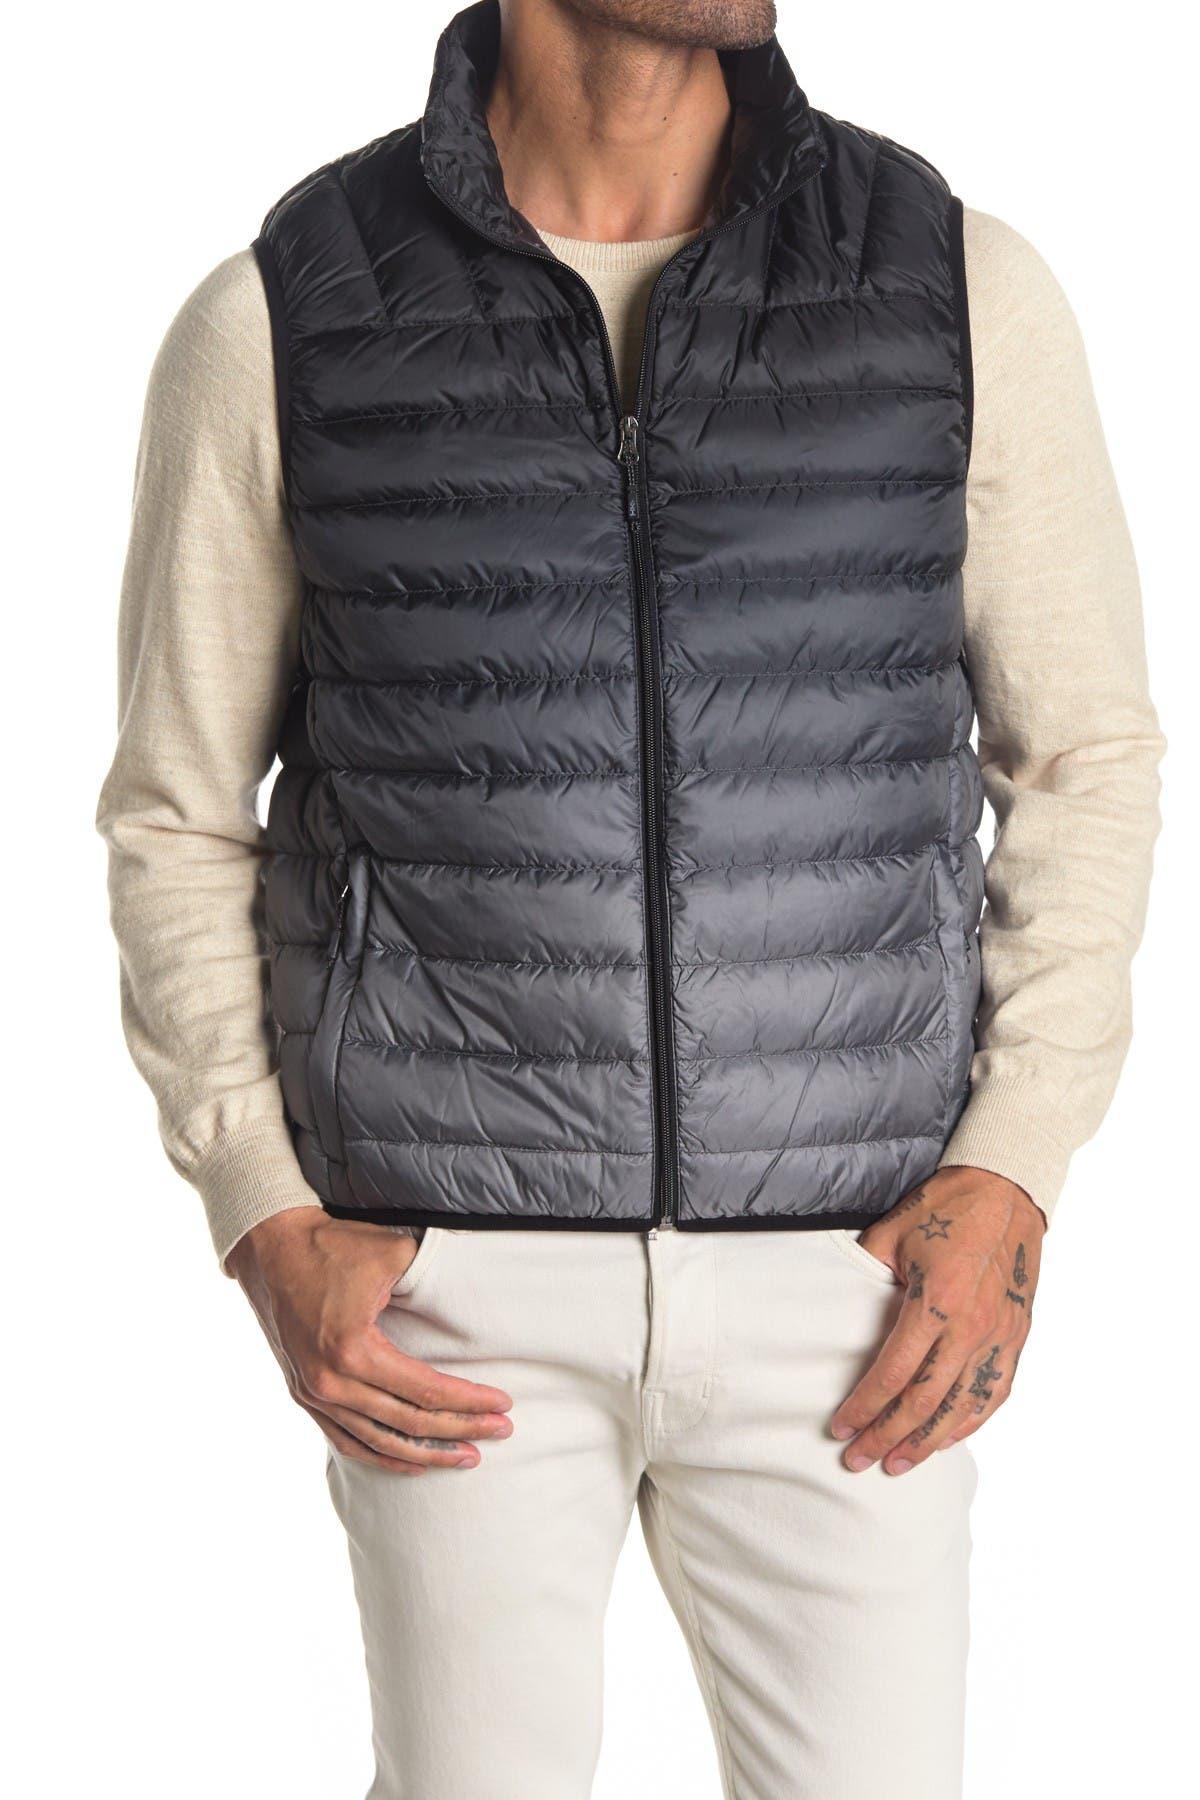 Image of Hawke & Co. Ombre Packer Zip Vest